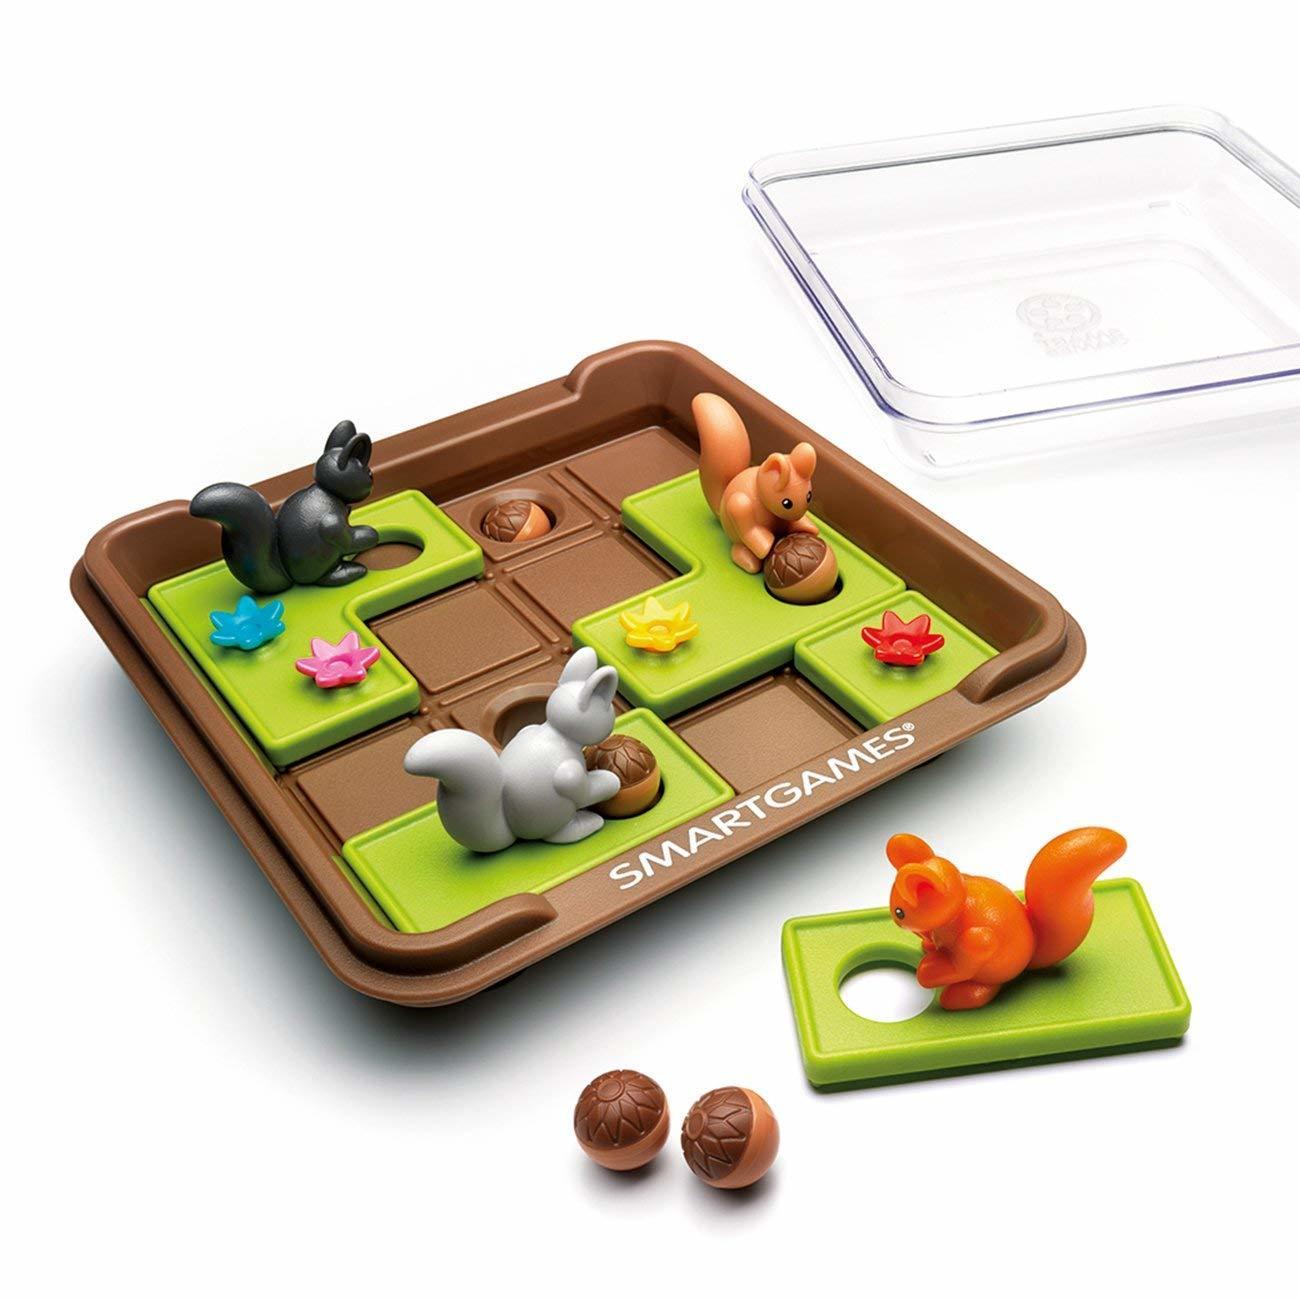 Smart Games: Squirrels go Nuts! - Logic Game image